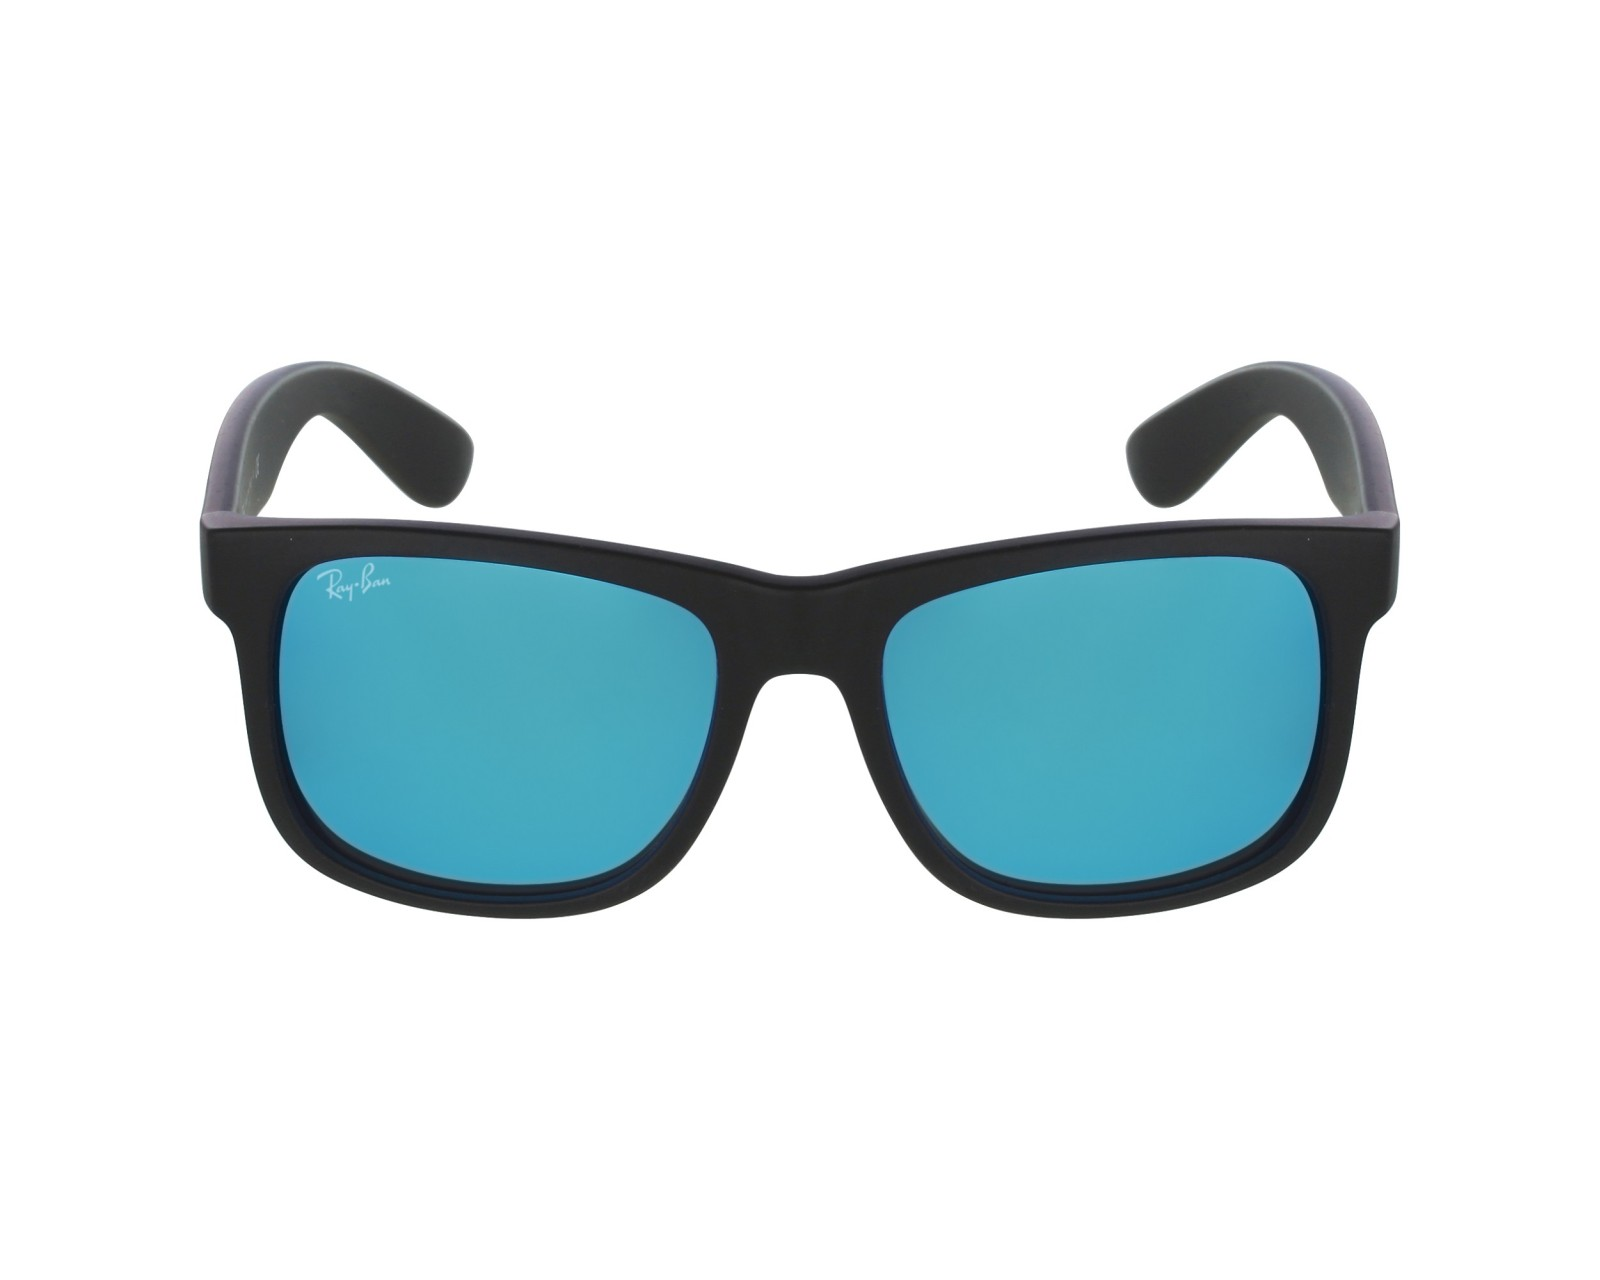 6fccf17d0f8 official ray ban 0rb4165 justin classic black sun b5935 72e46  usa sunglasses  ray ban rb 4165 622 55 51 16 black profile view 9edbc 465ae